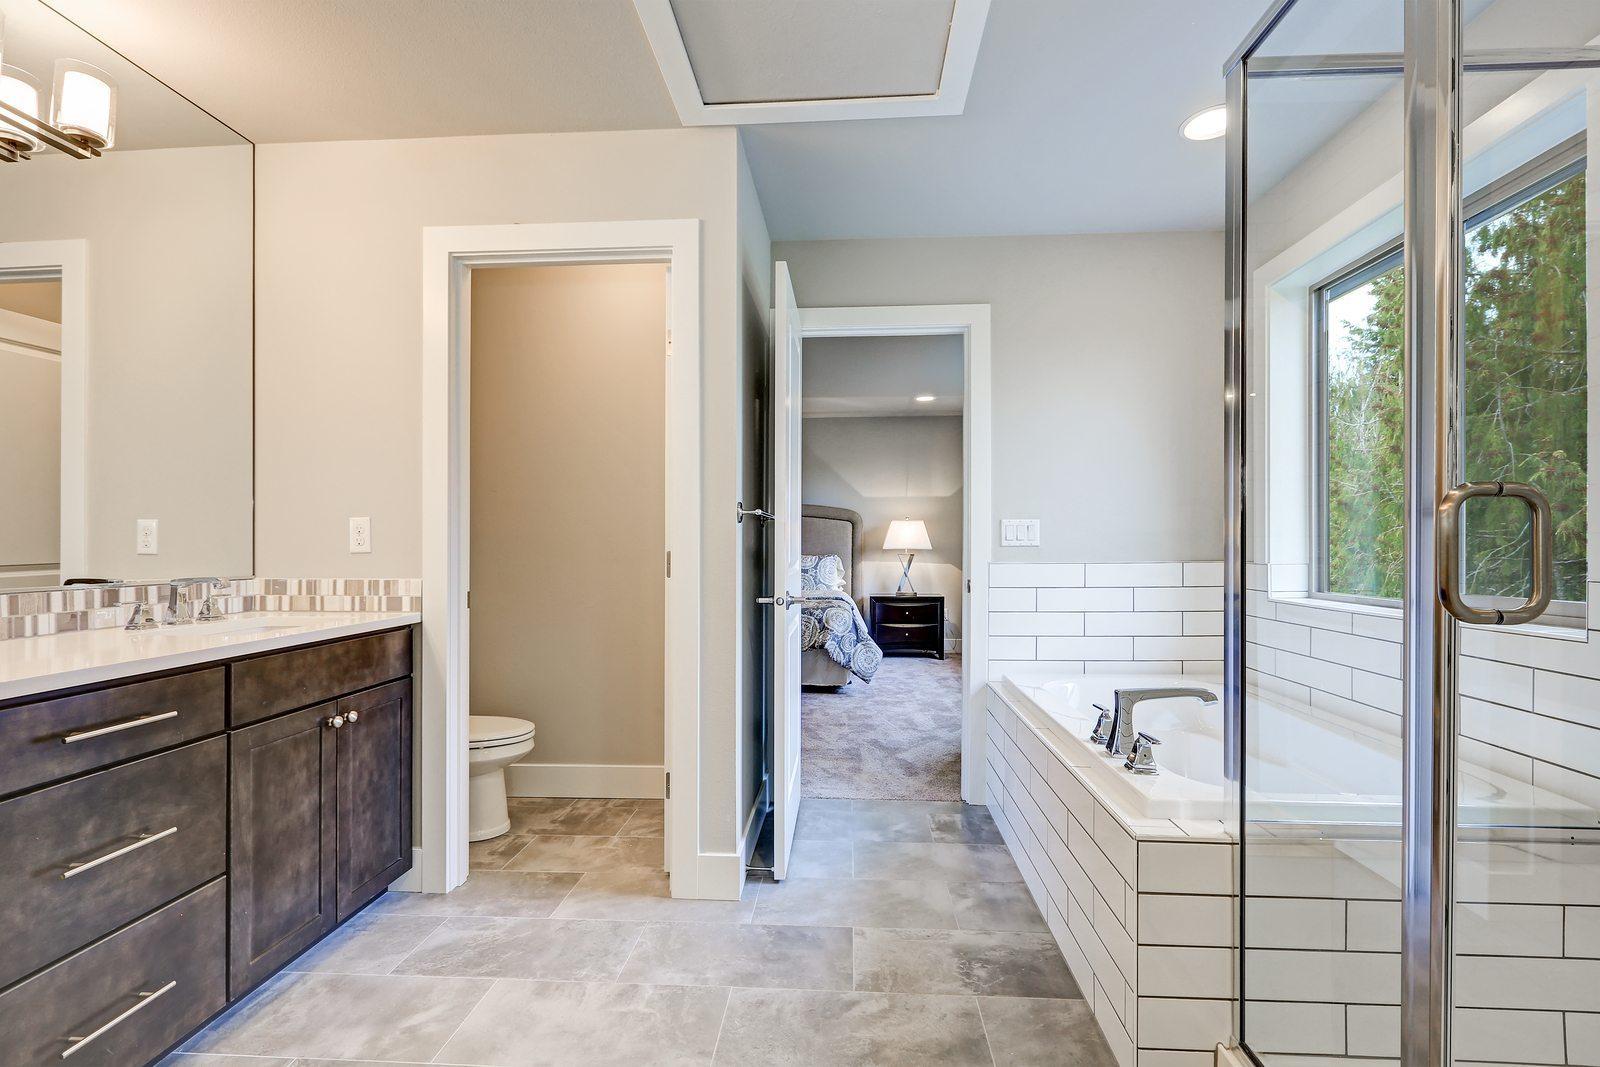 Gorgeous bathroom interior boasts drop-in tub with white tile surround next to glass shower dark wood bathroom vanity accented with mosaic backsplash. Northwest USA